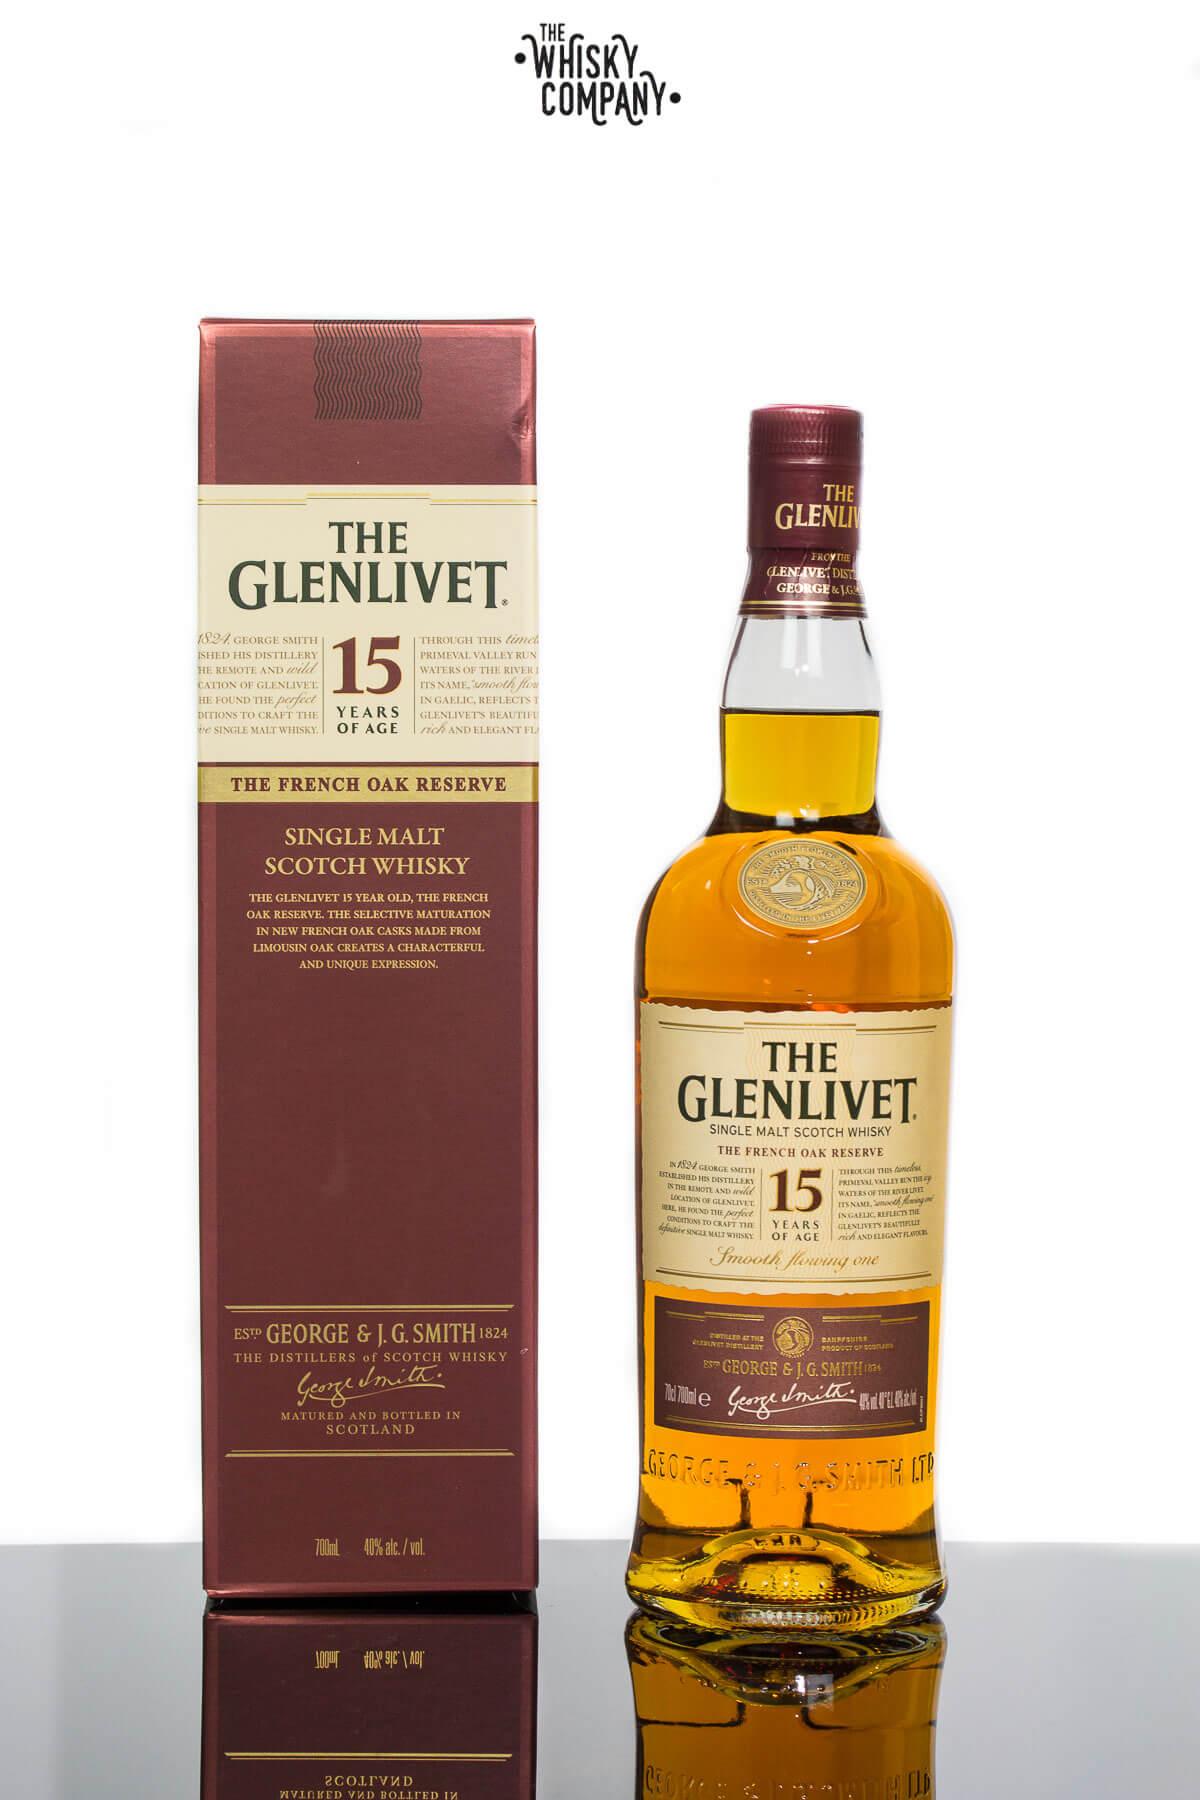 The Glenlivet 15 Year Old French Oak Reserve Single Malt Scotch Whisky